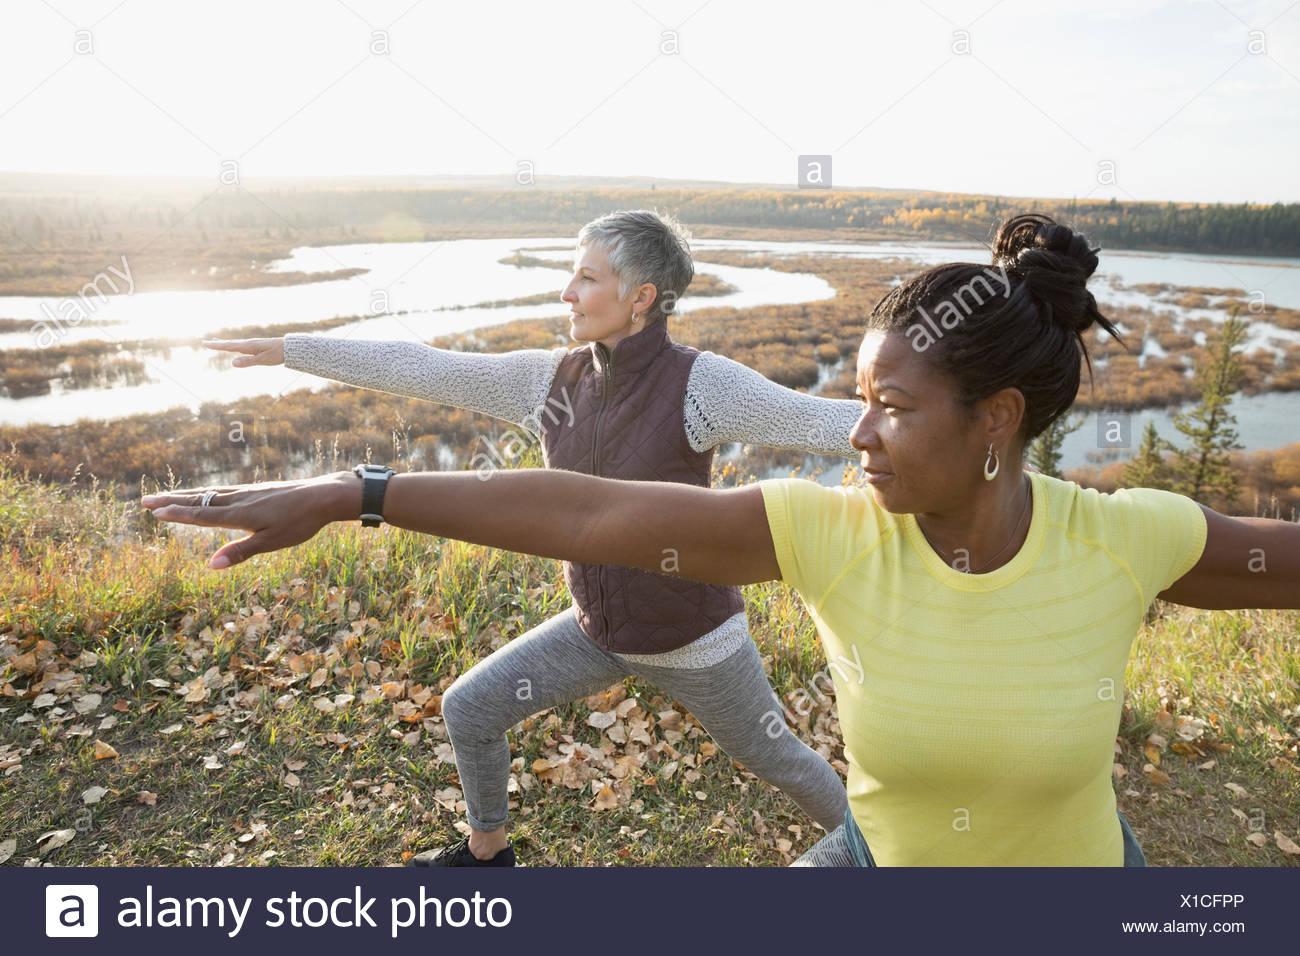 Women practicing yoga warrior 2 pose on autumn hilltop overlooking lake Stock Photo